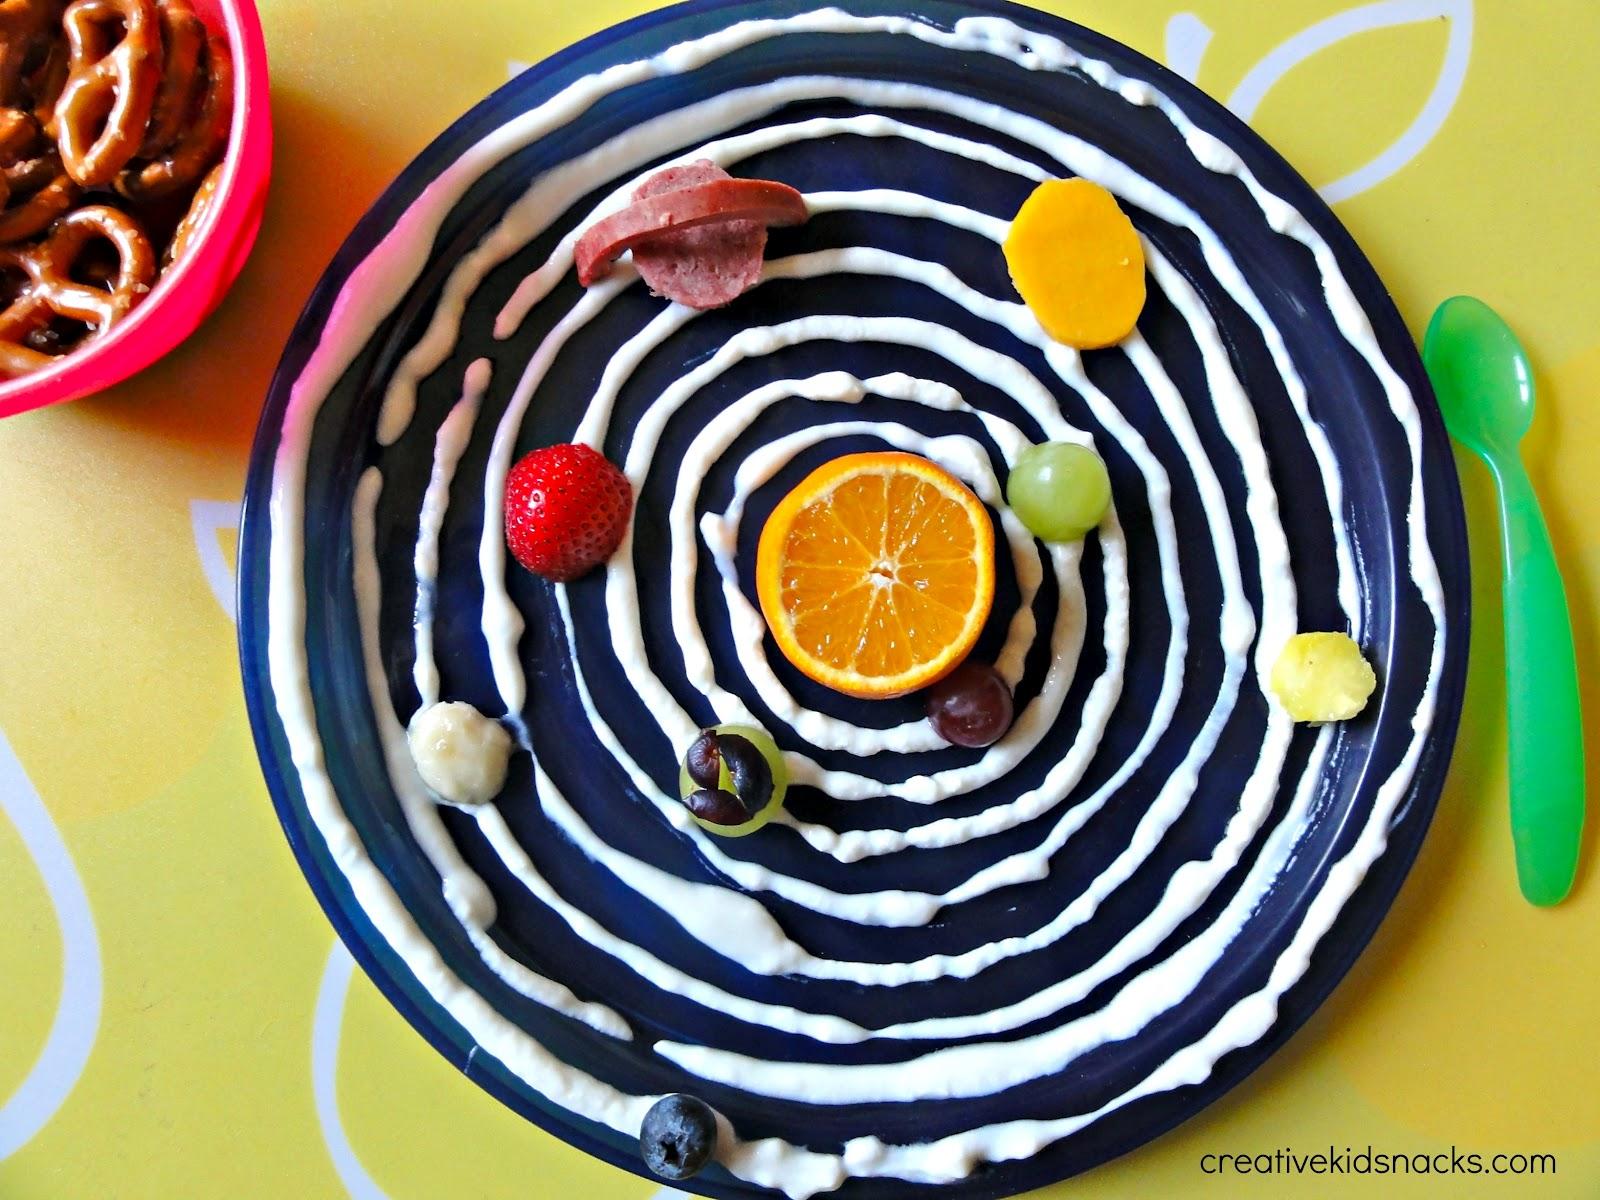 edible solar system project ideas - photo #10